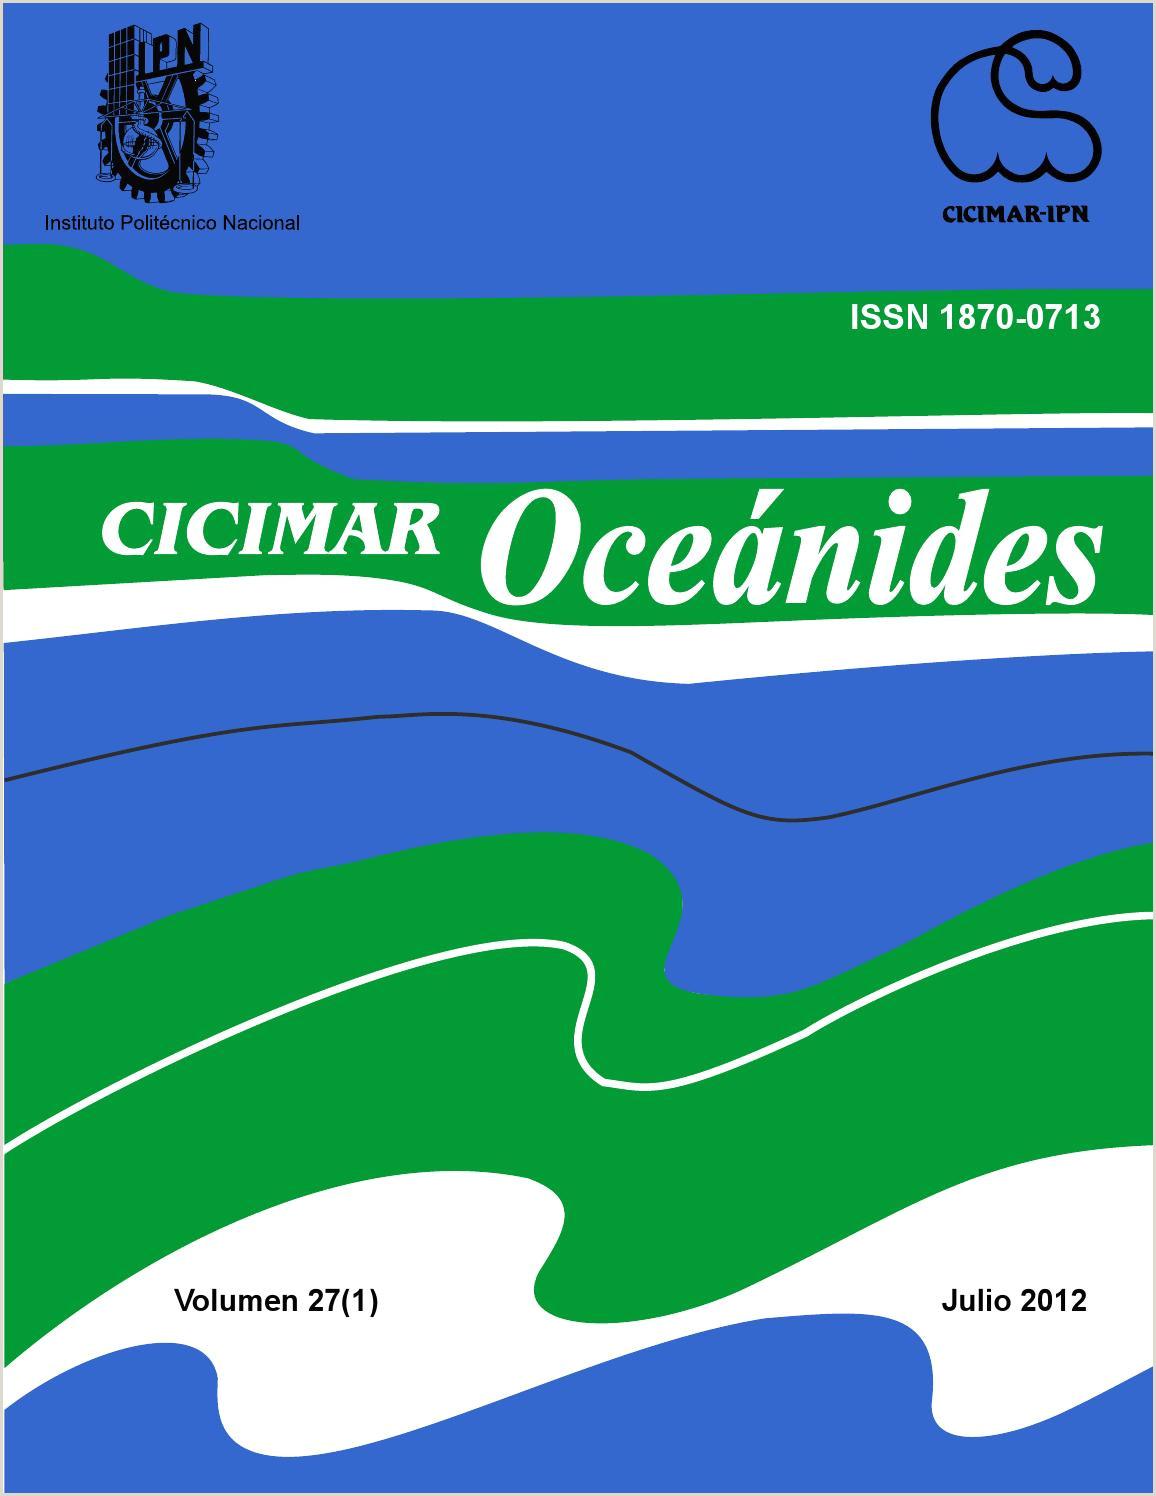 CICIMAR Oceánides Vol 27 1 2012 by CICIMAR Oceánides issuu